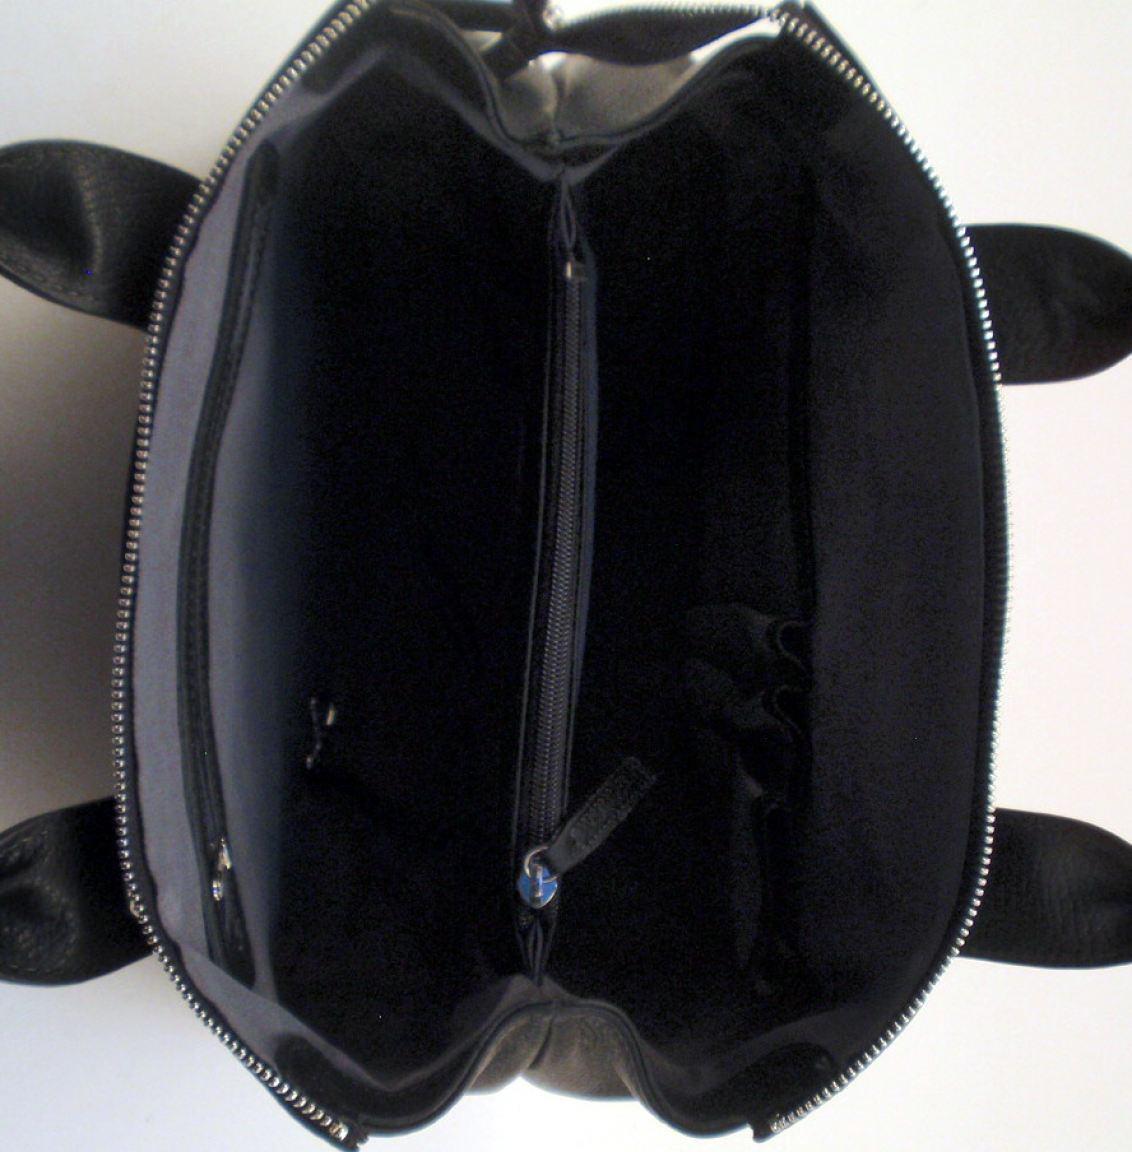 credi tasche in hochwertigem strukturiertem nappaleder. Black Bedroom Furniture Sets. Home Design Ideas